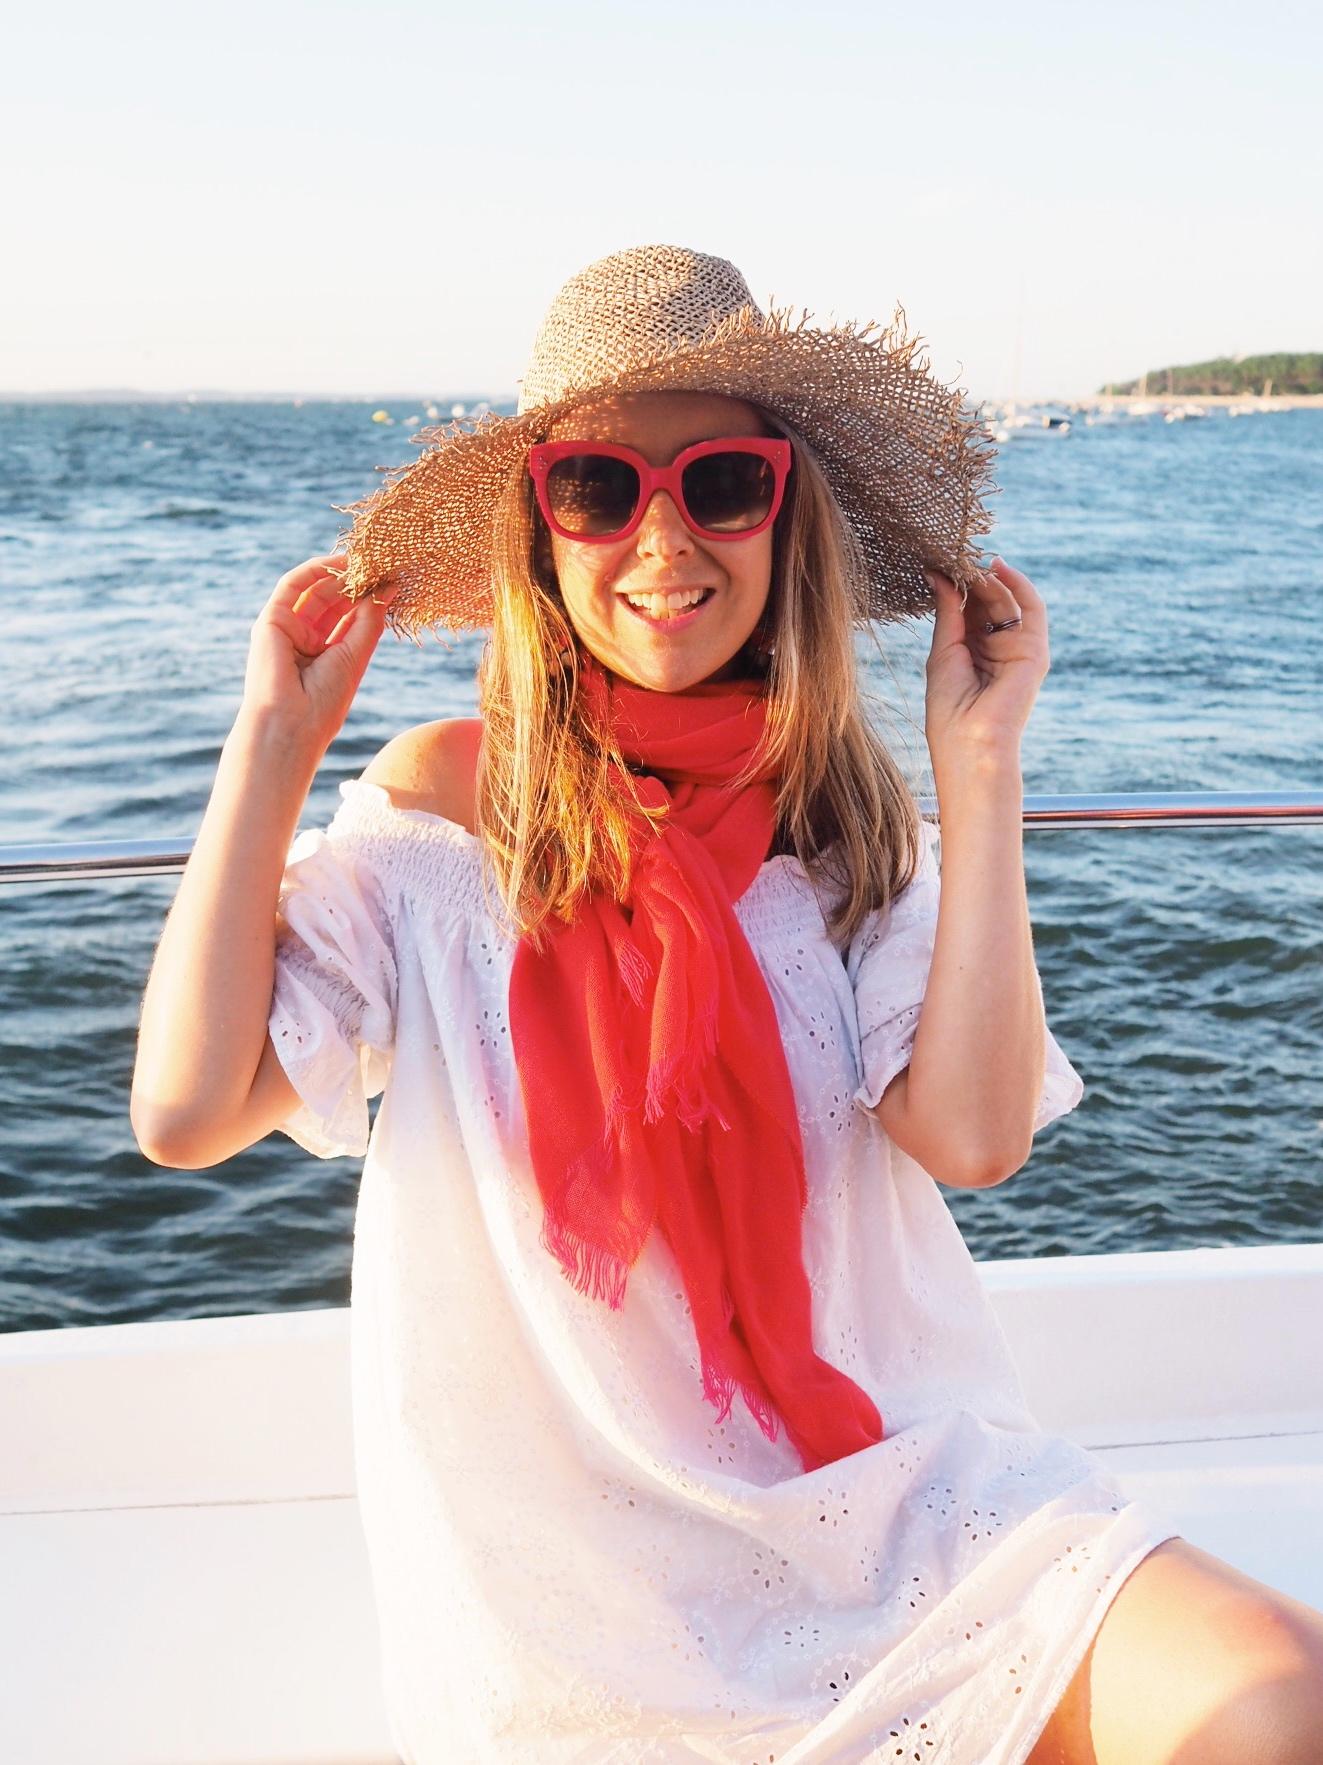 Wearing the Italian Days scarf in  Tangerine